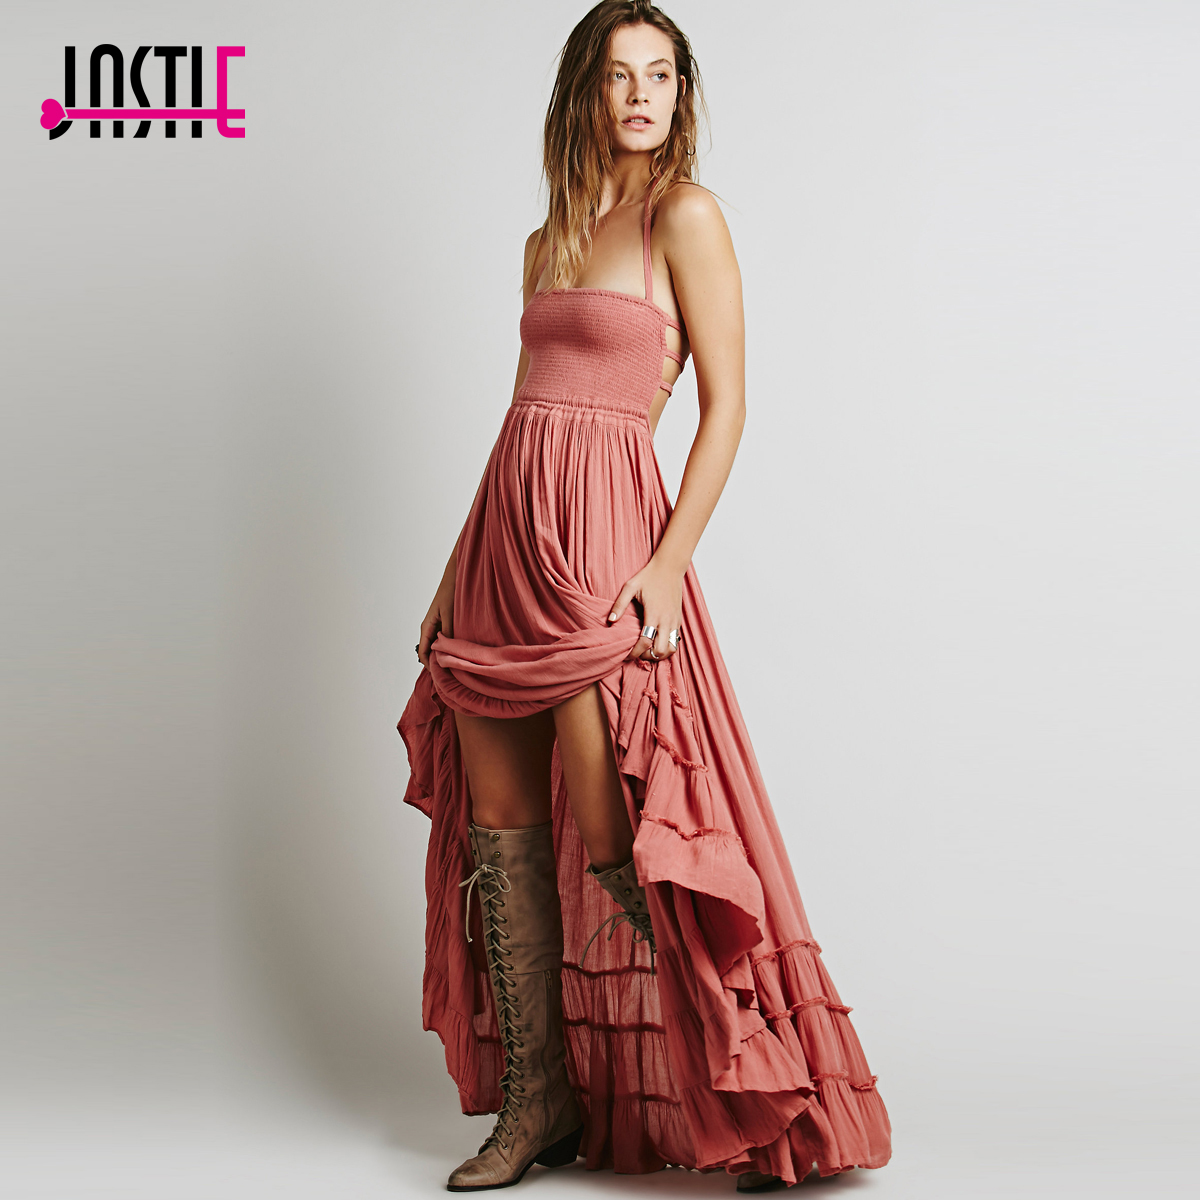 Boho Beach Dresses for Women